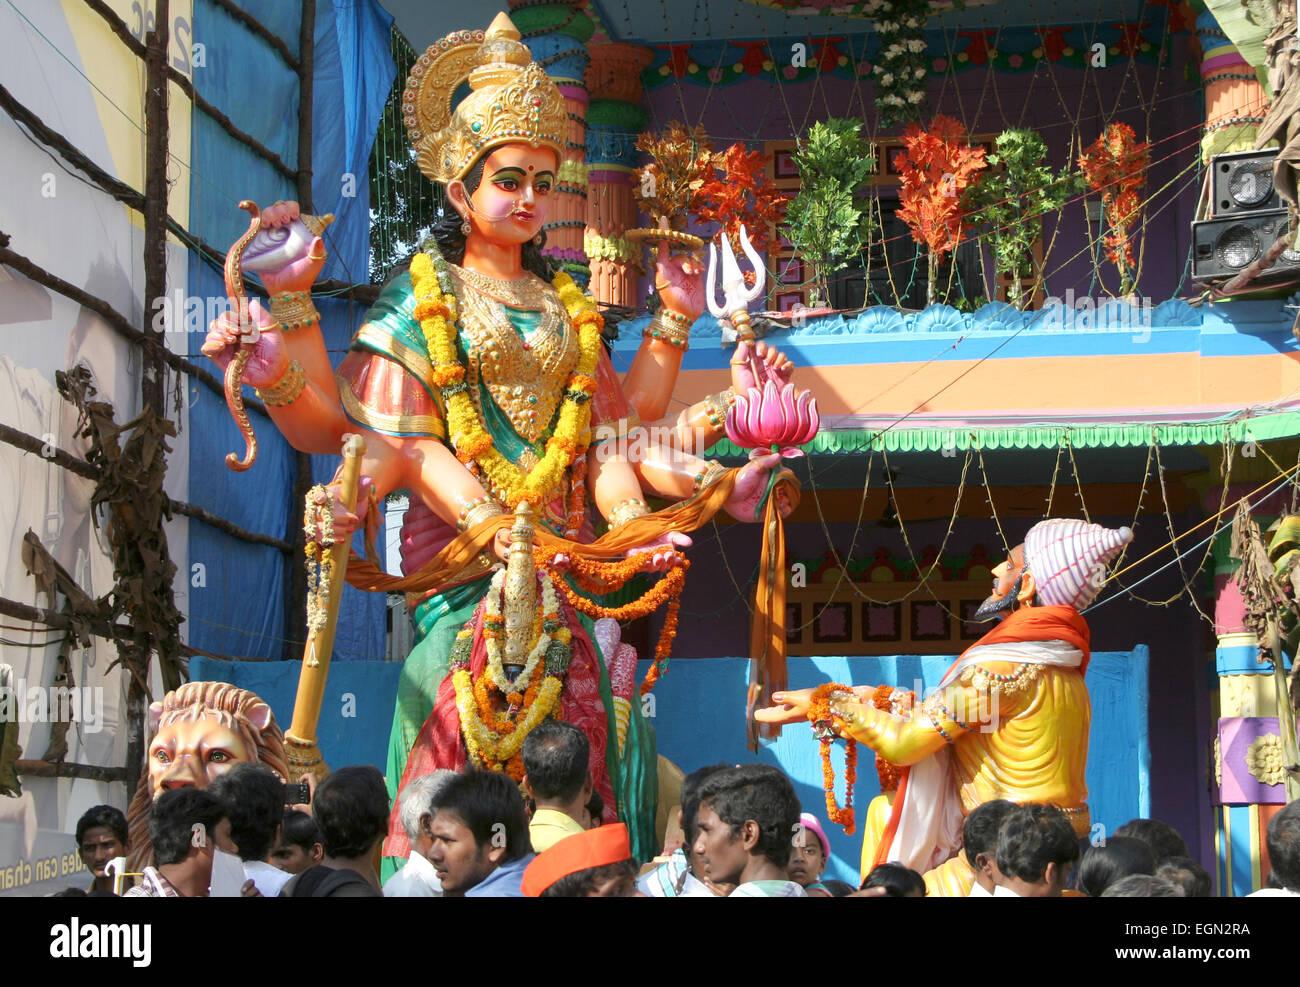 Shivaji offering prayer to durga during ganesh chathurthi Hindu festival,khairatabad,on 28,September 2012 in Hyderabad,India. Stock Photo